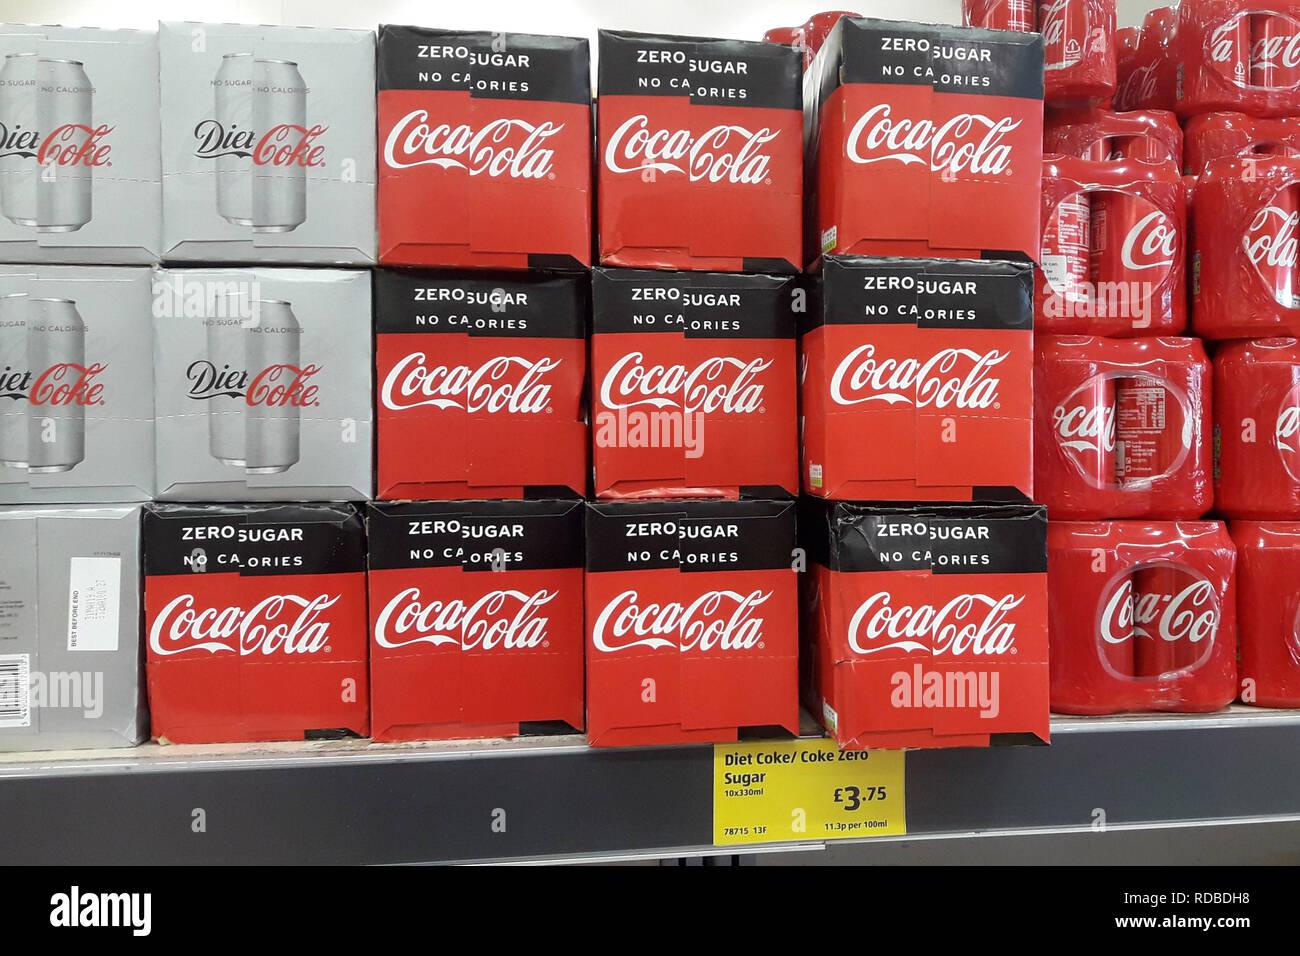 Coke Zero Stock Photos & Coke Zero Stock Images - Alamy